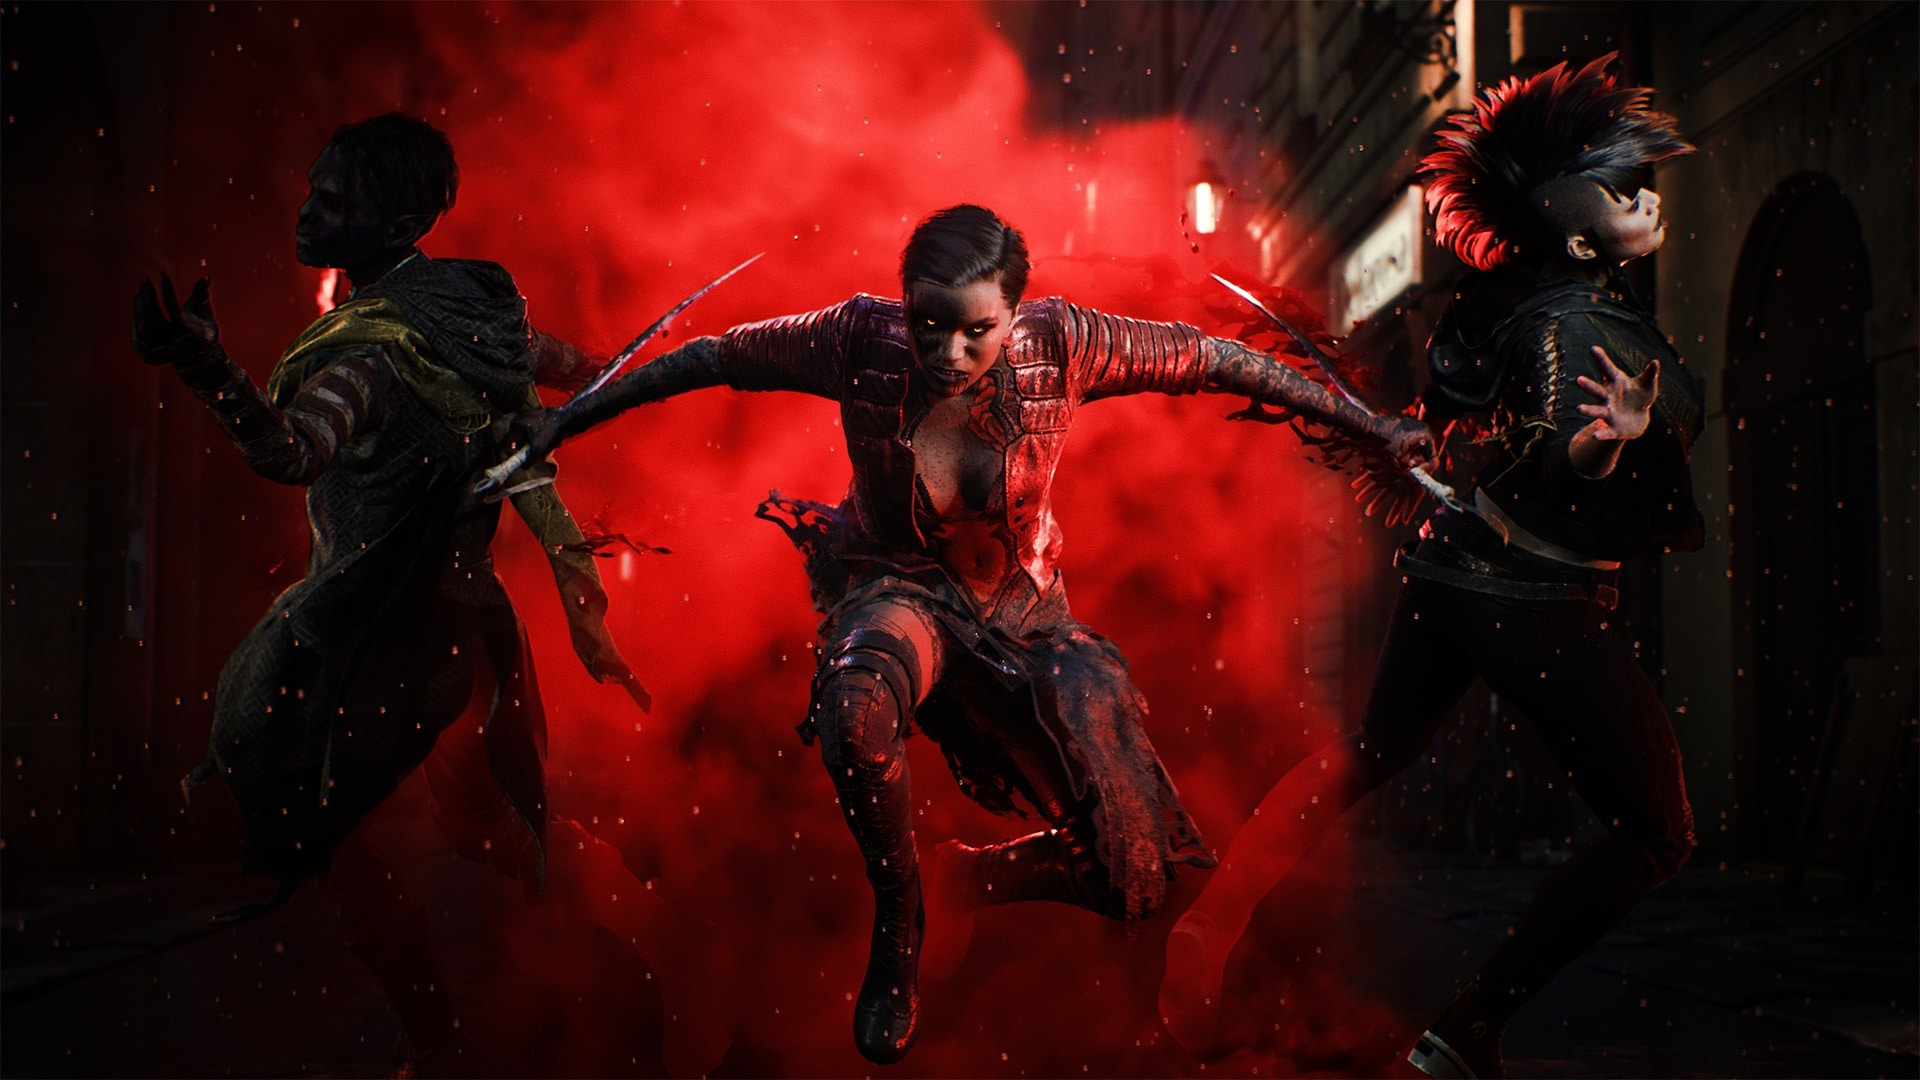 Vampire The Masquerade: Blood Hunt art